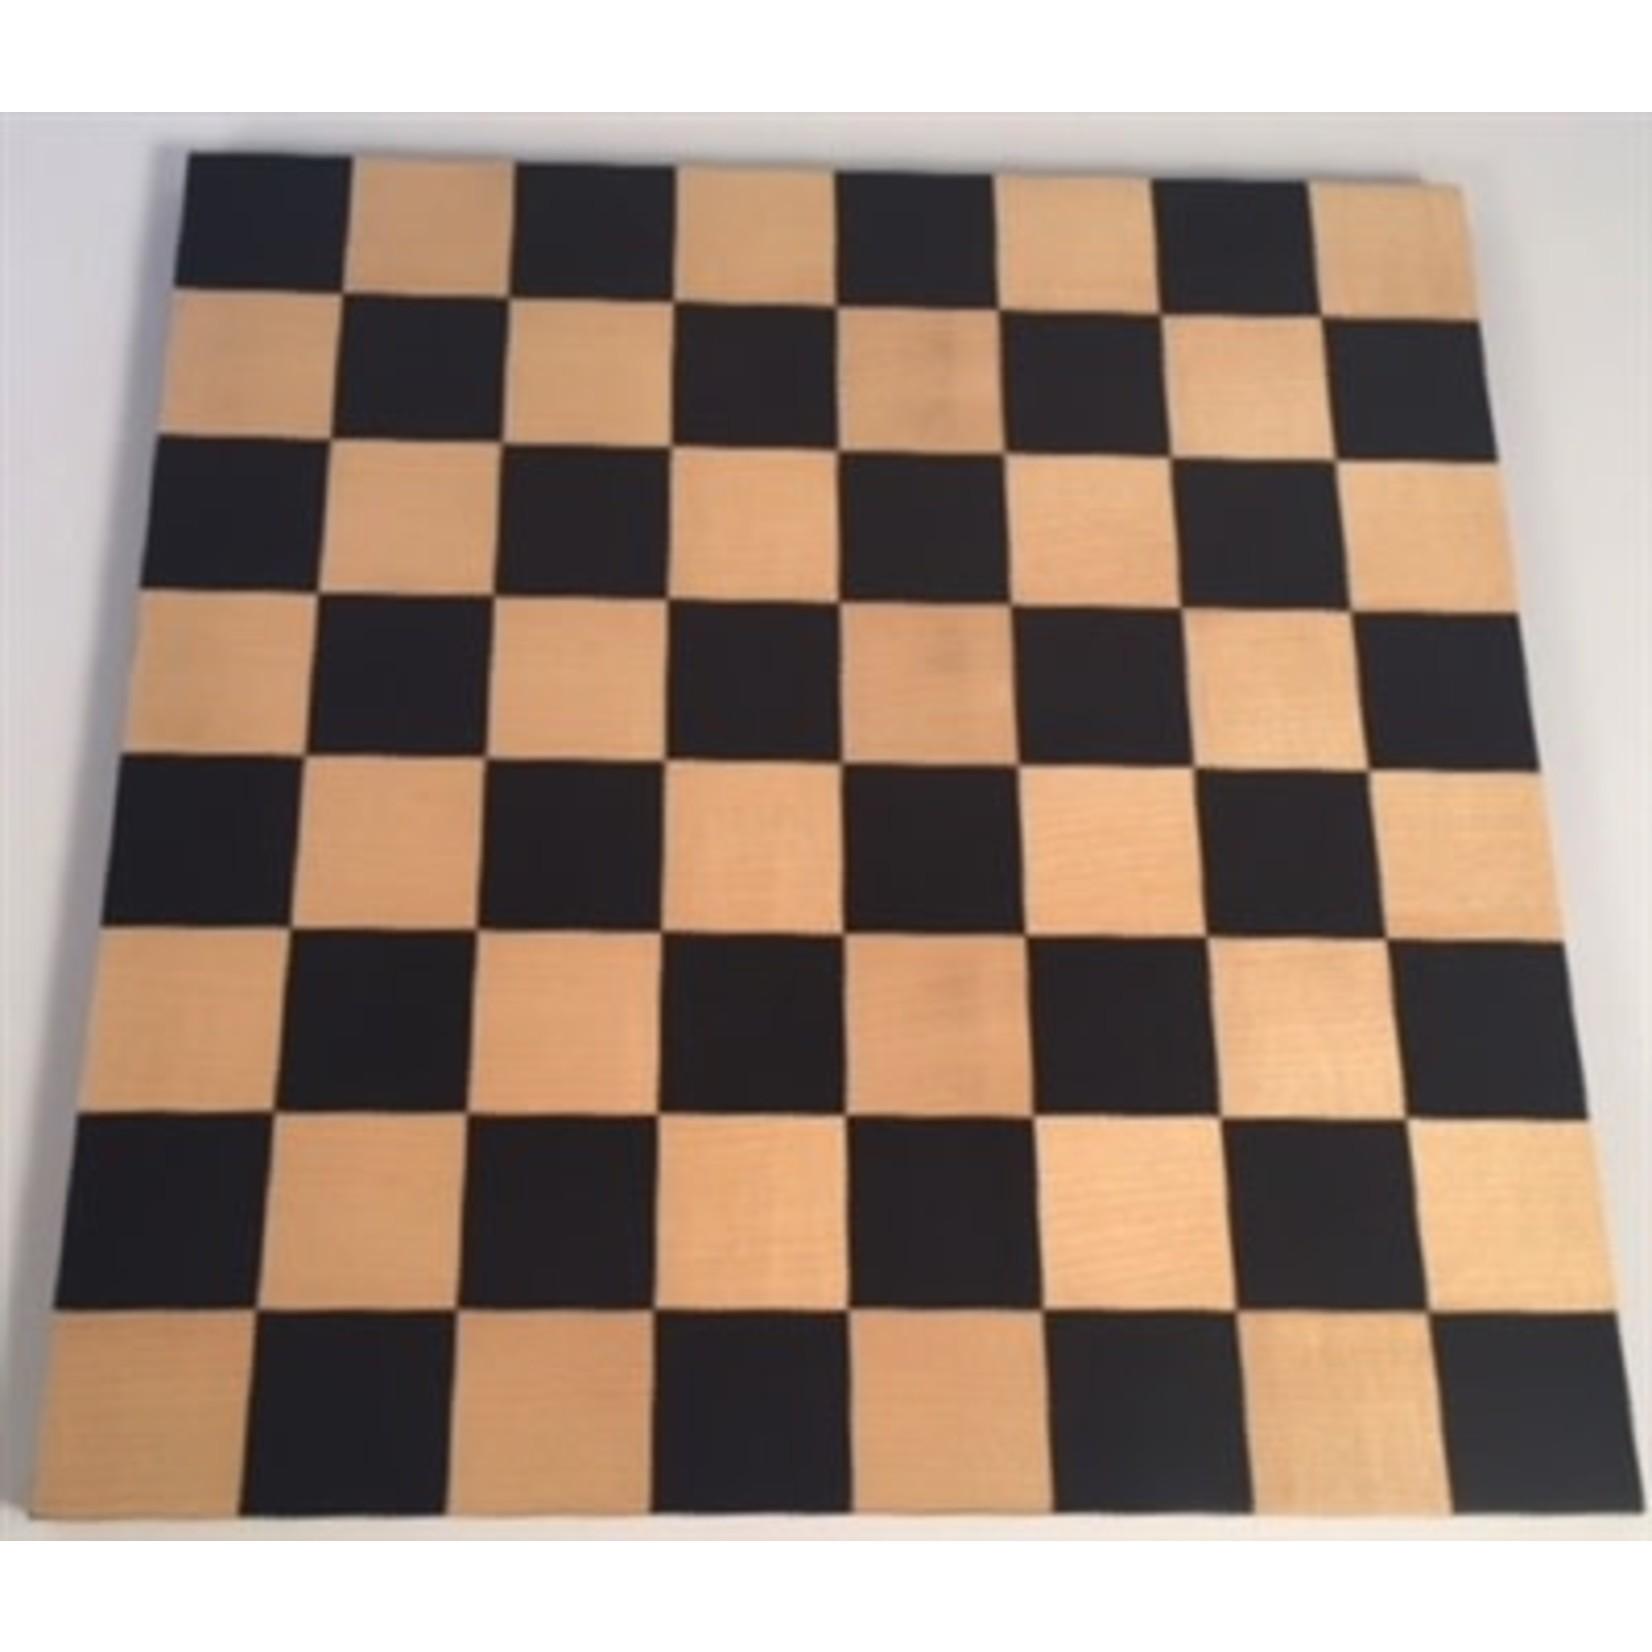 "Worldwise Imports Chess Board 14"" Black & Maple"